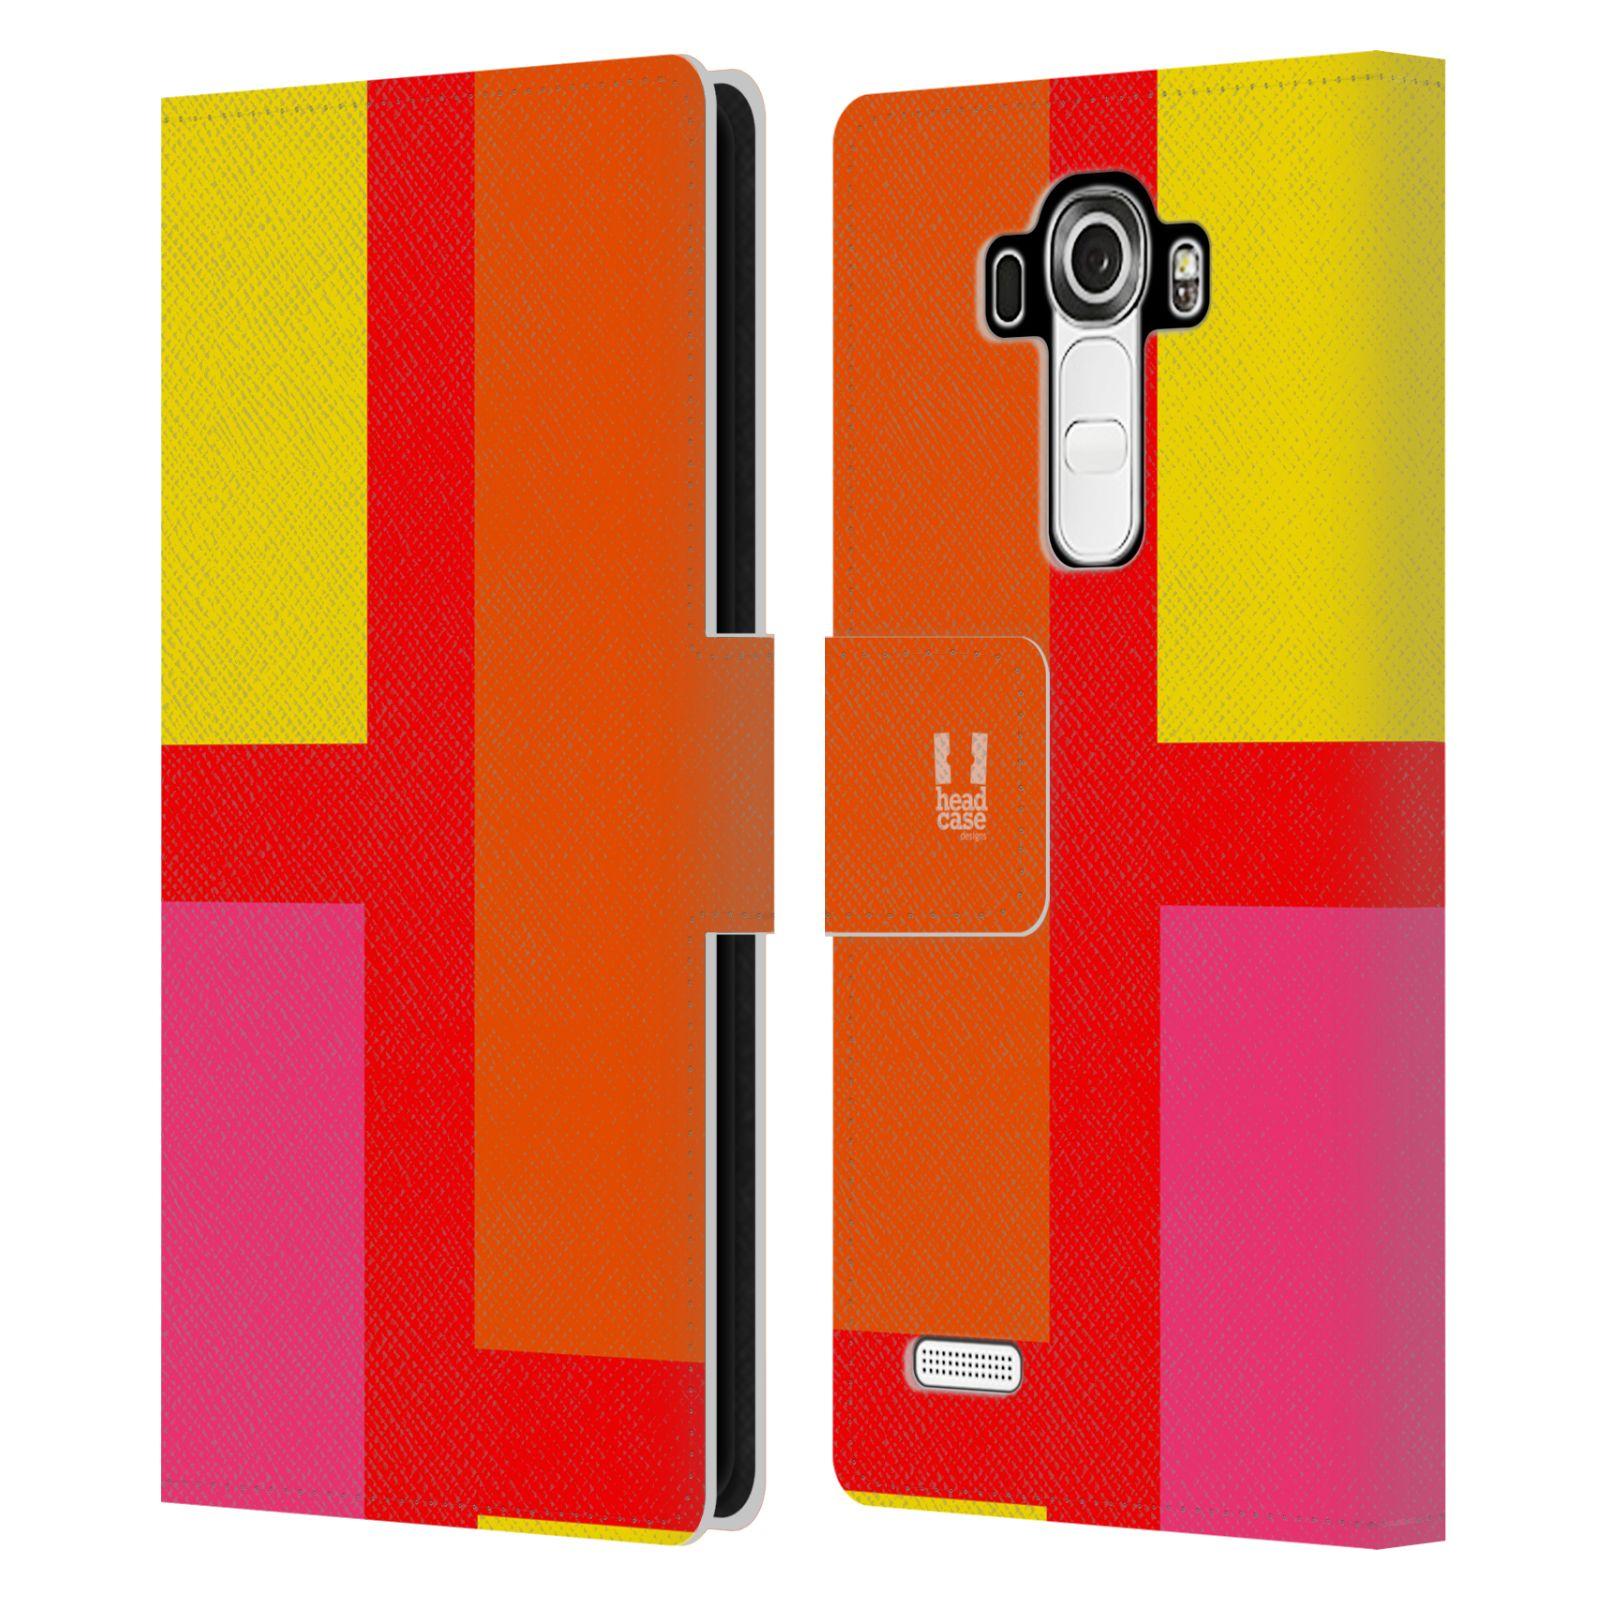 HEAD CASE Flipové pouzdro pro mobil LG G4 barevné tvary oranžová ulice